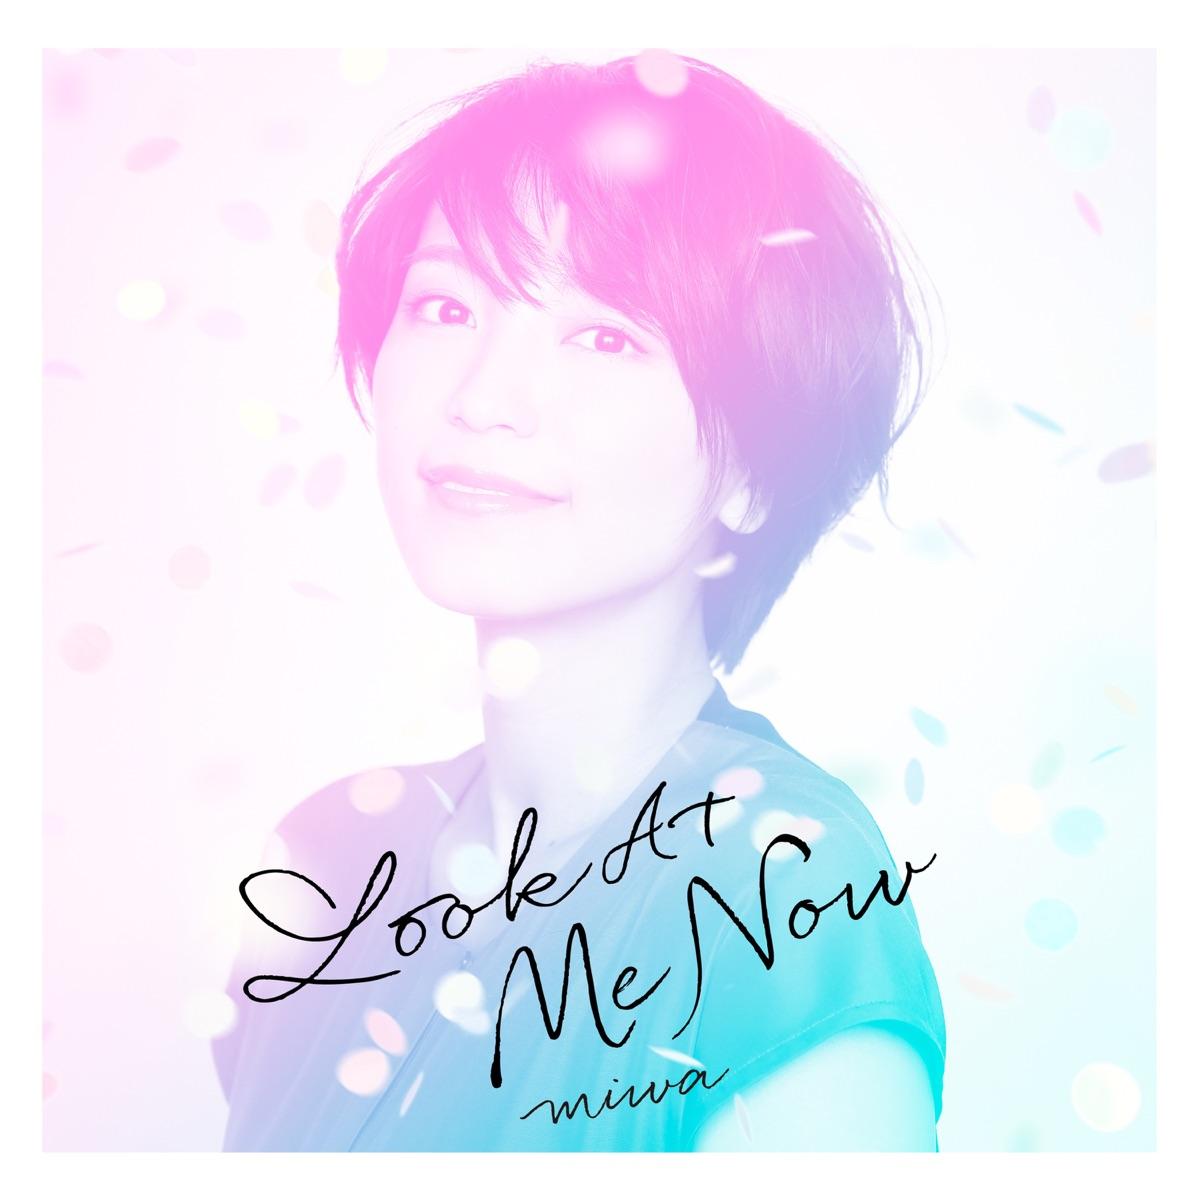 『miwa - Look At Me Now』収録の『Look At Me Now』ジャケット